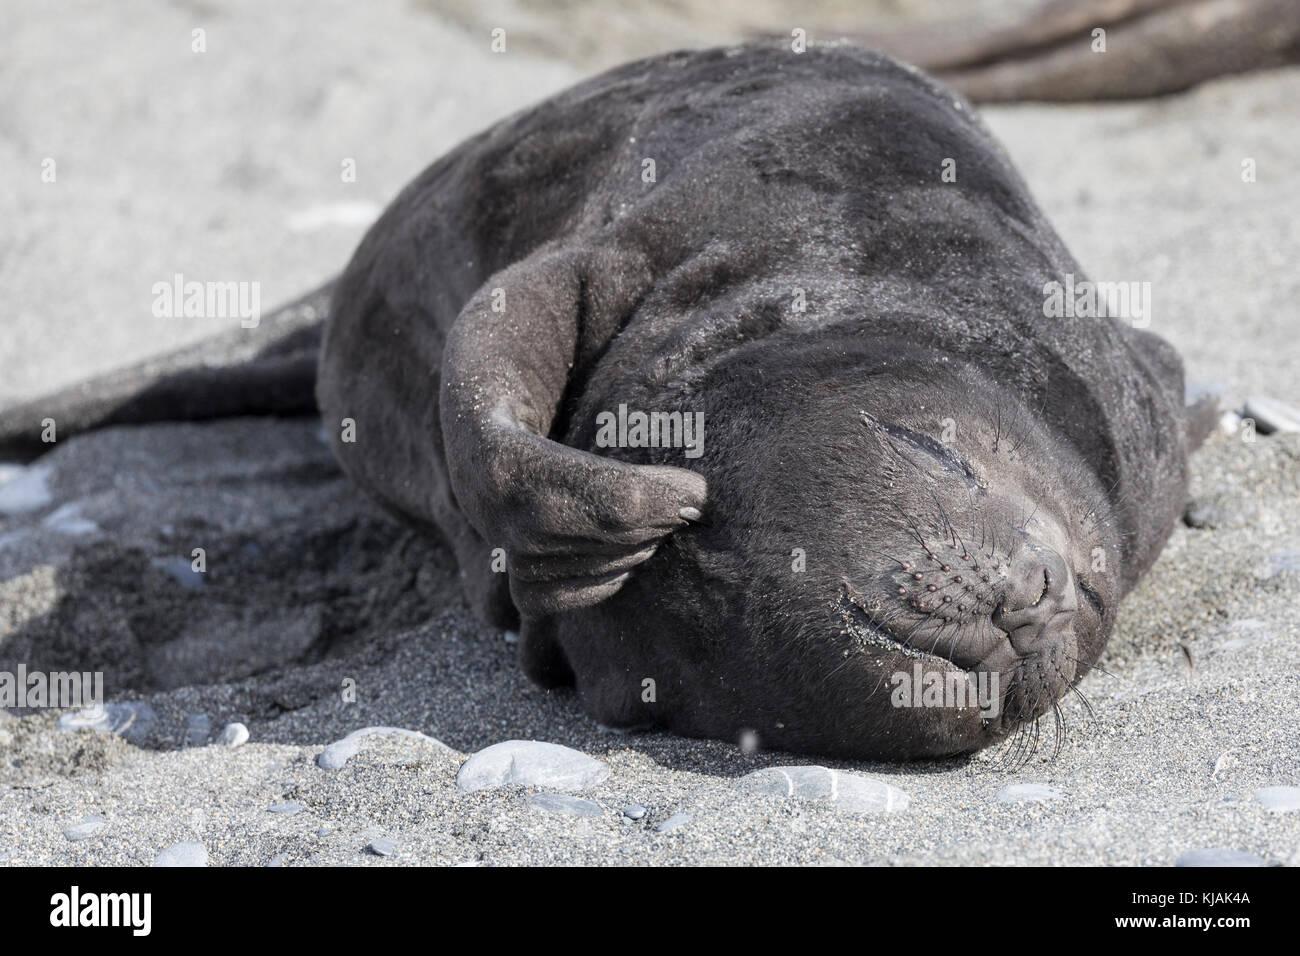 Elephant seal pup scratching an itch, Salisbury Plain, South Georgia Island - Stock Image